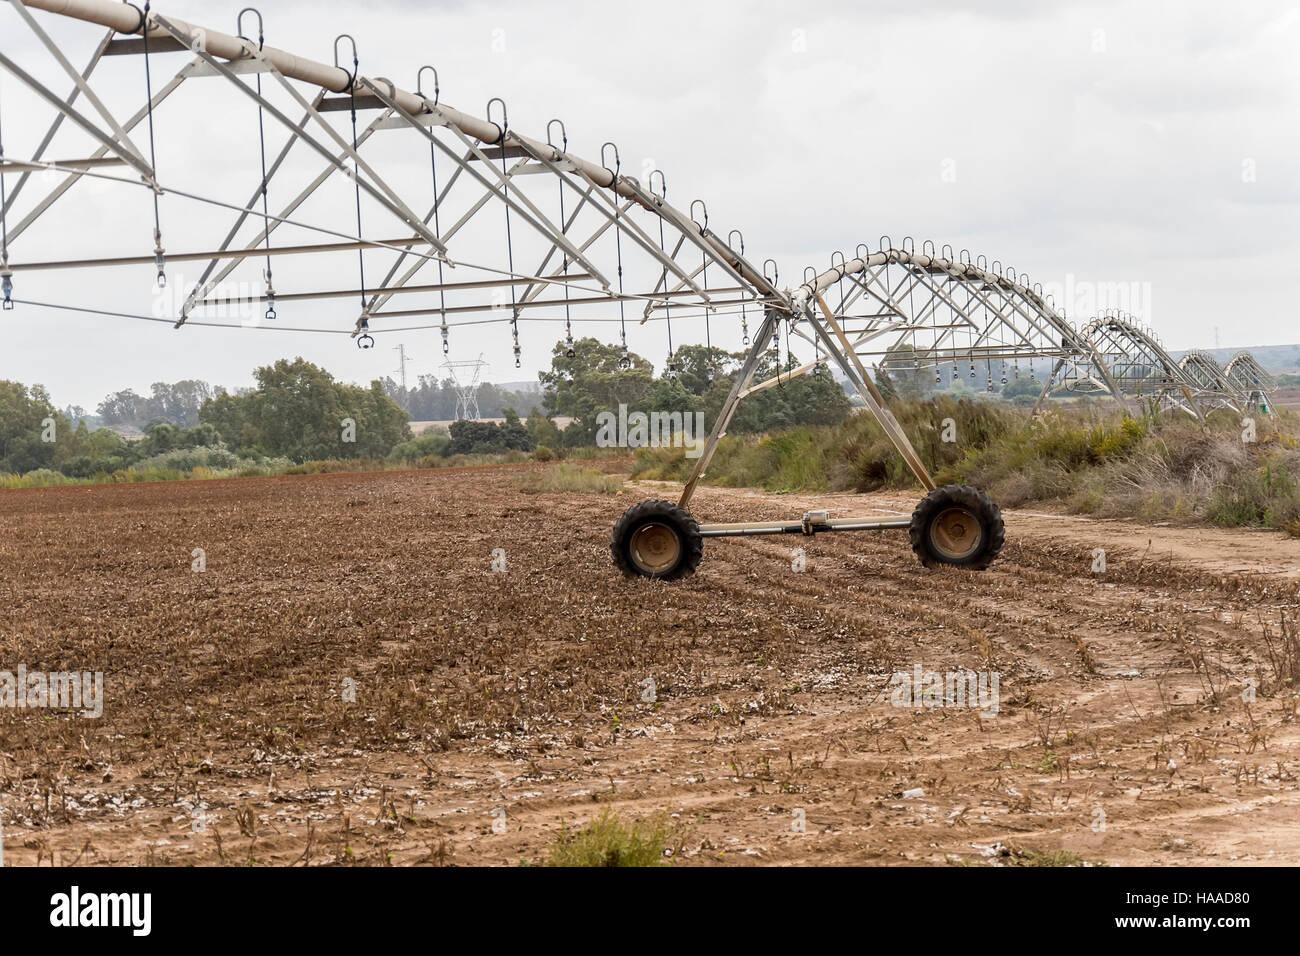 Irrigation pivot system watering - Stock Image